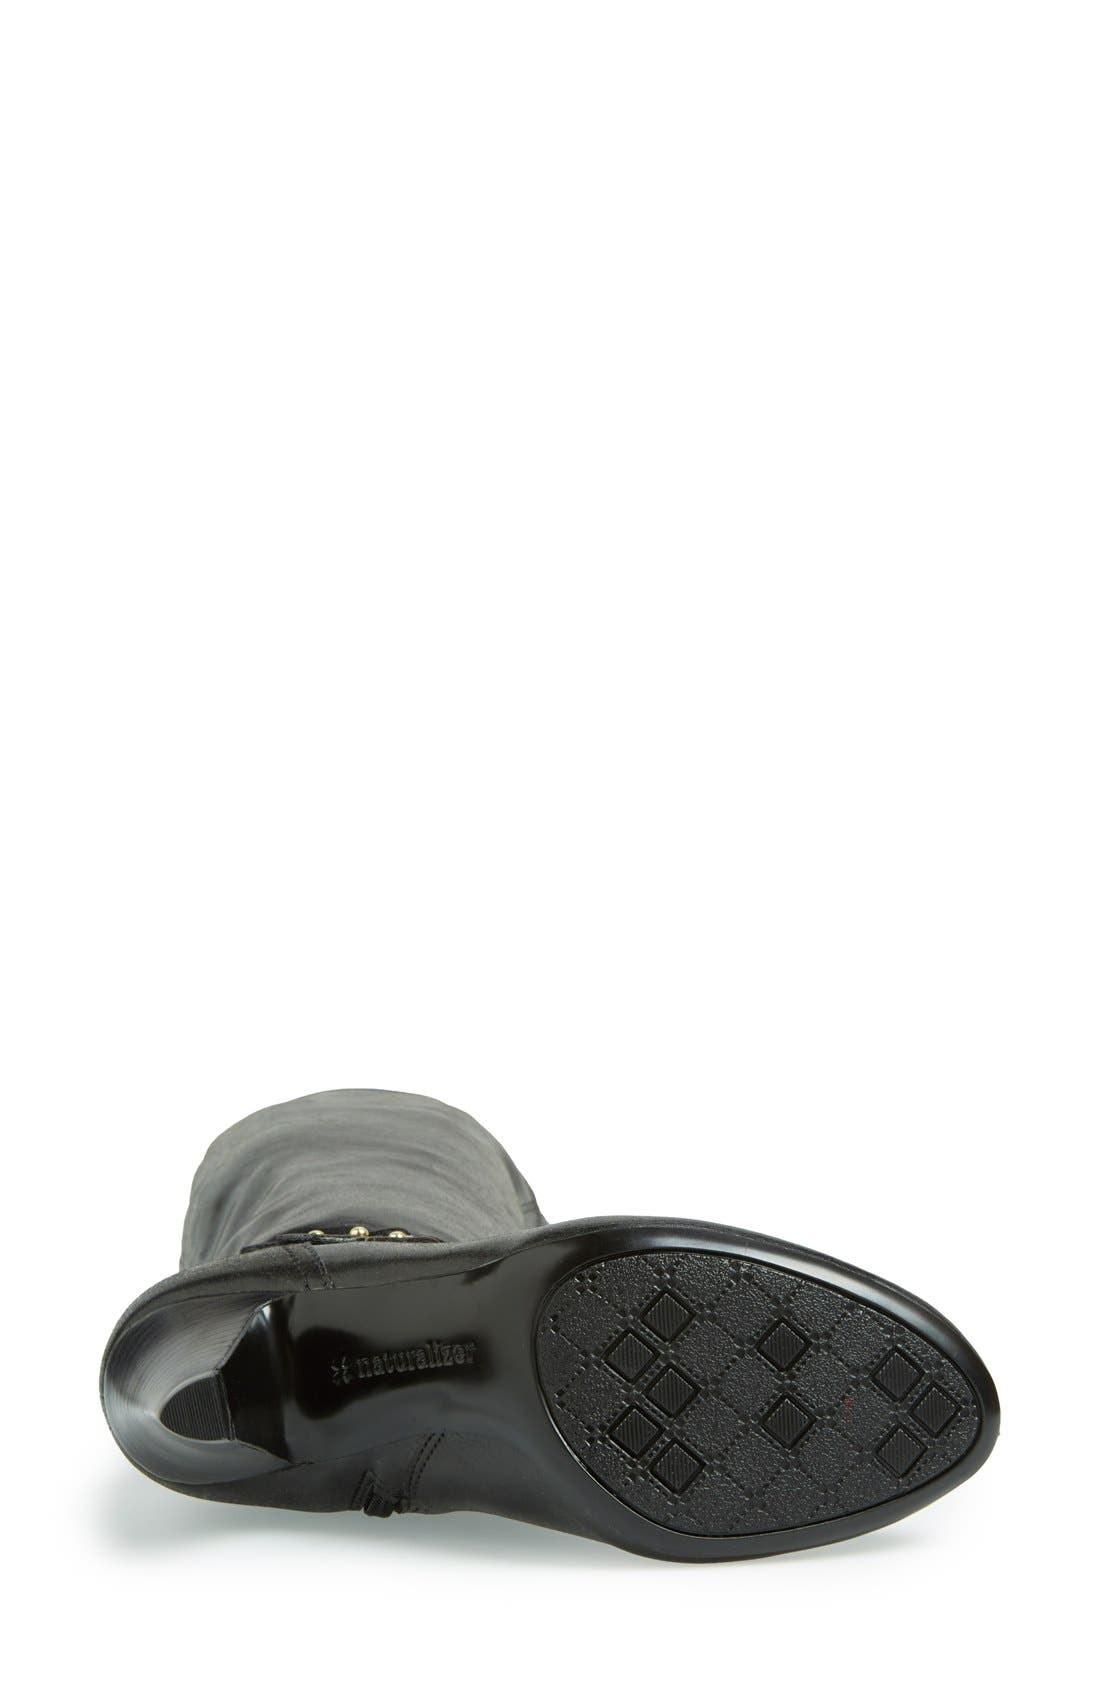 Alternate Image 4  - Naturalizer 'Byron' Knee High Boot (Women)(Wide Calf)